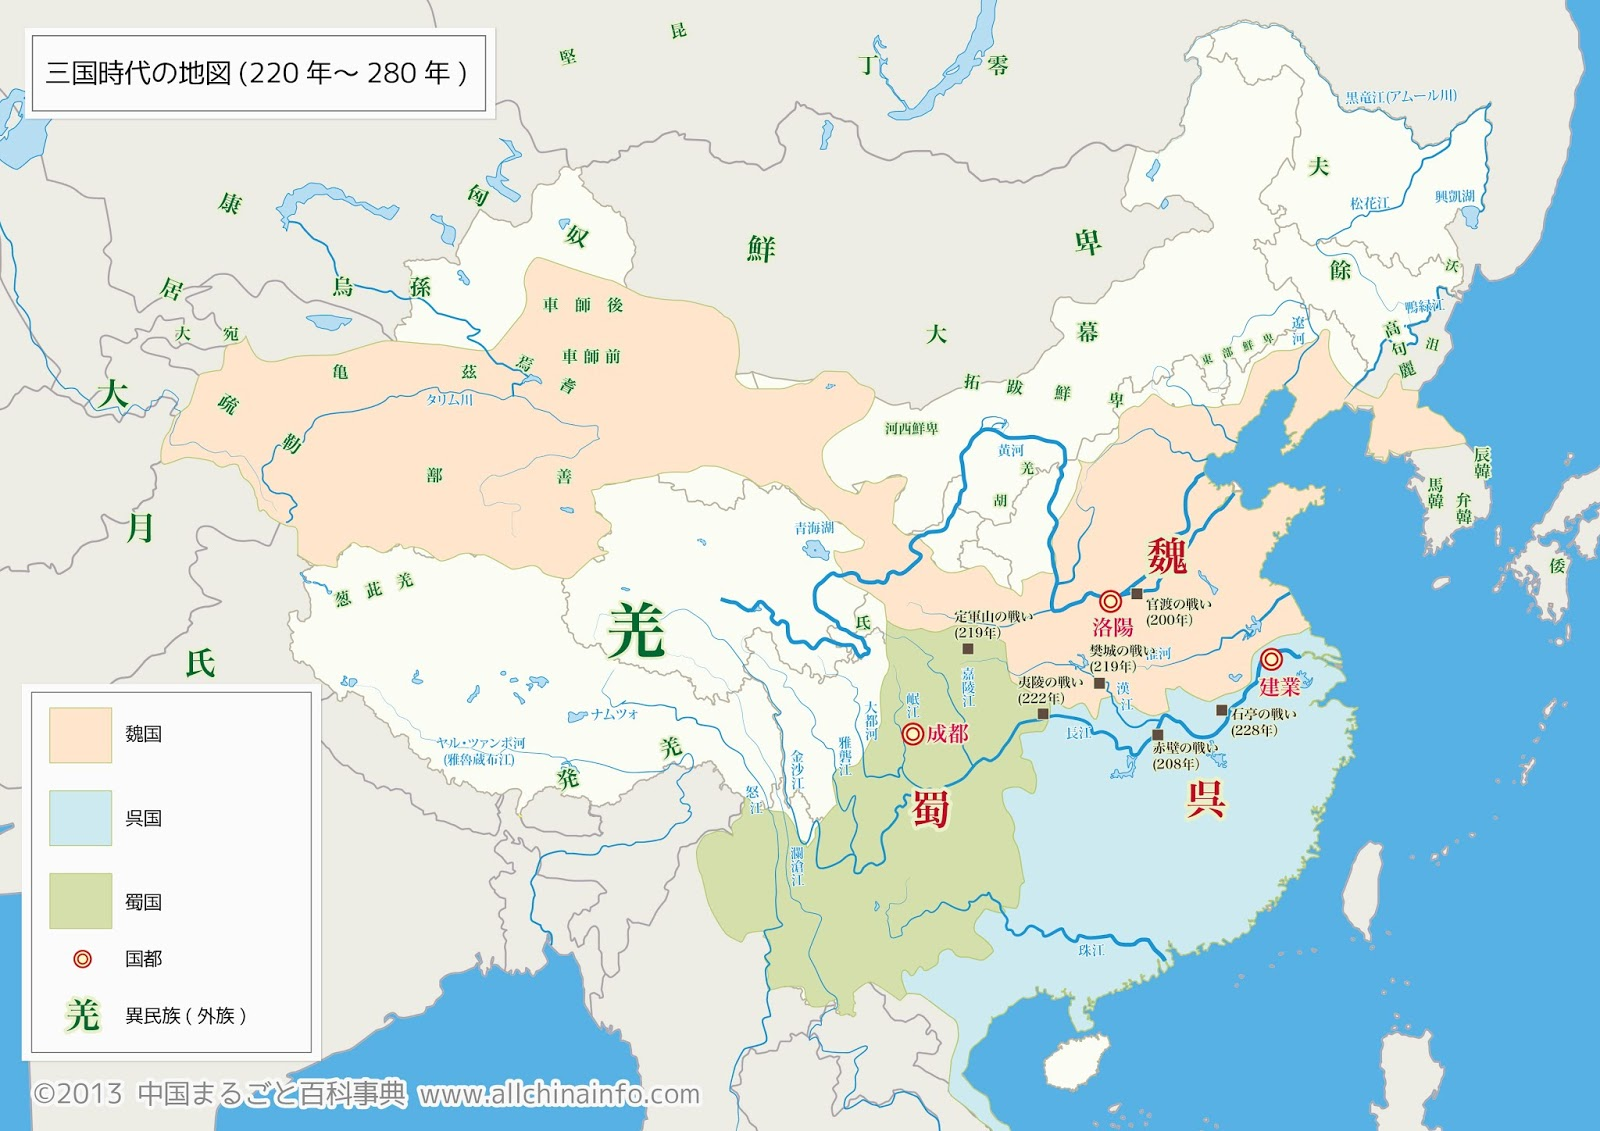 天下三分②~中国史⑧-history labo